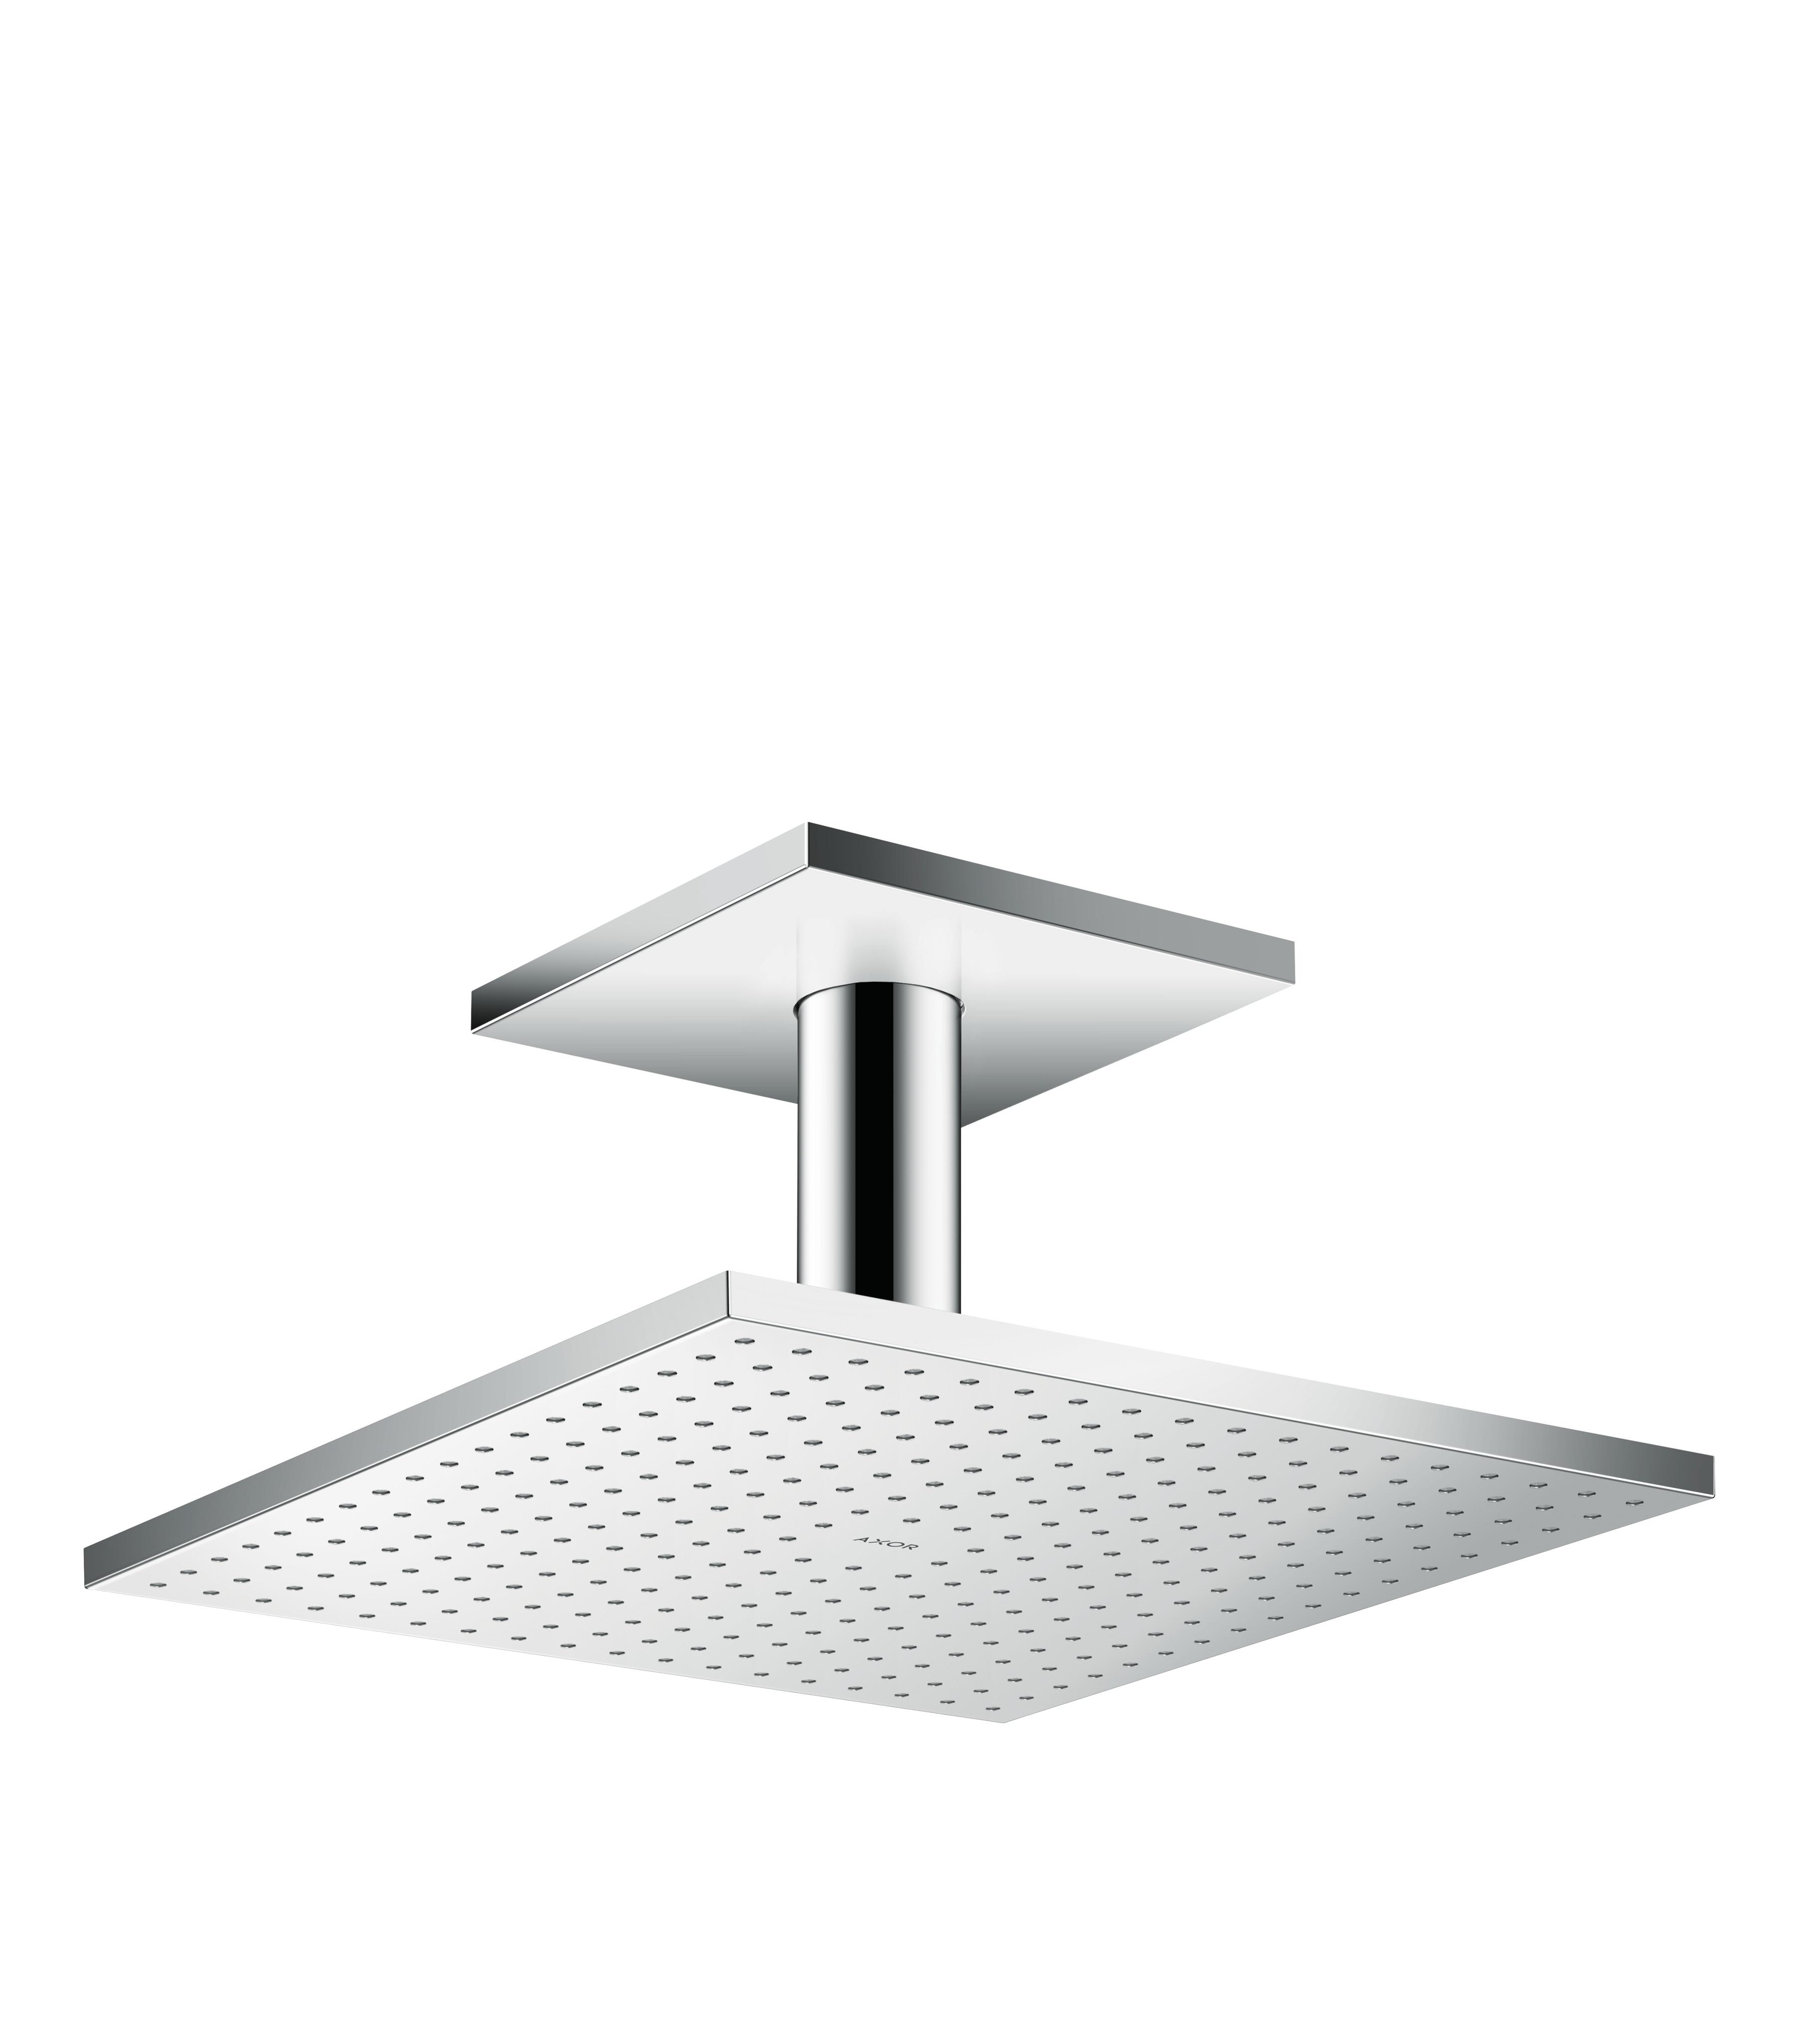 Axor Int Axor Showersolutions 1 Spray Mode 35316000